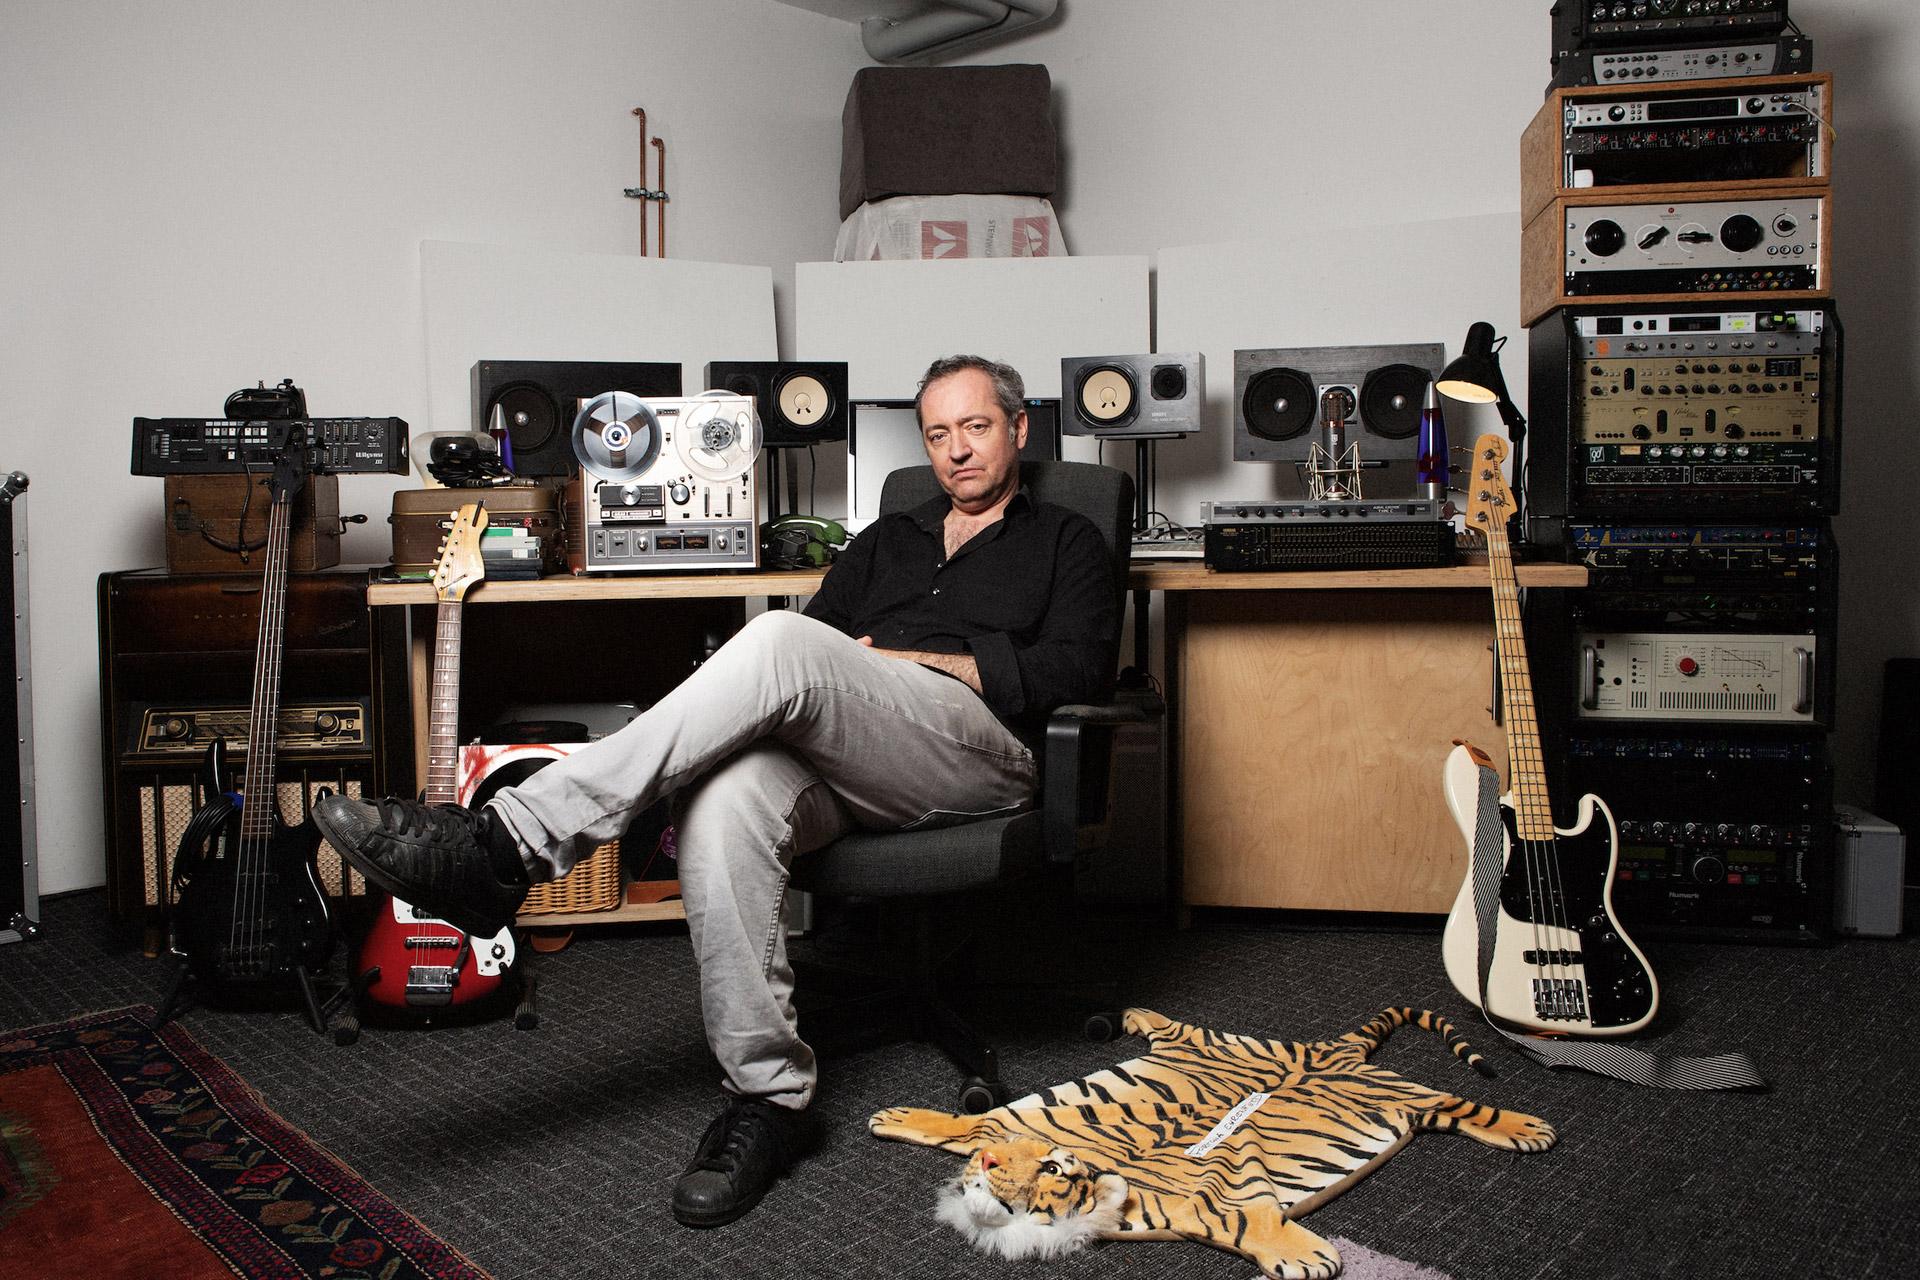 Reinald Grebe - - Pressefoto 2020 - s'läuft! Radio-Promotion